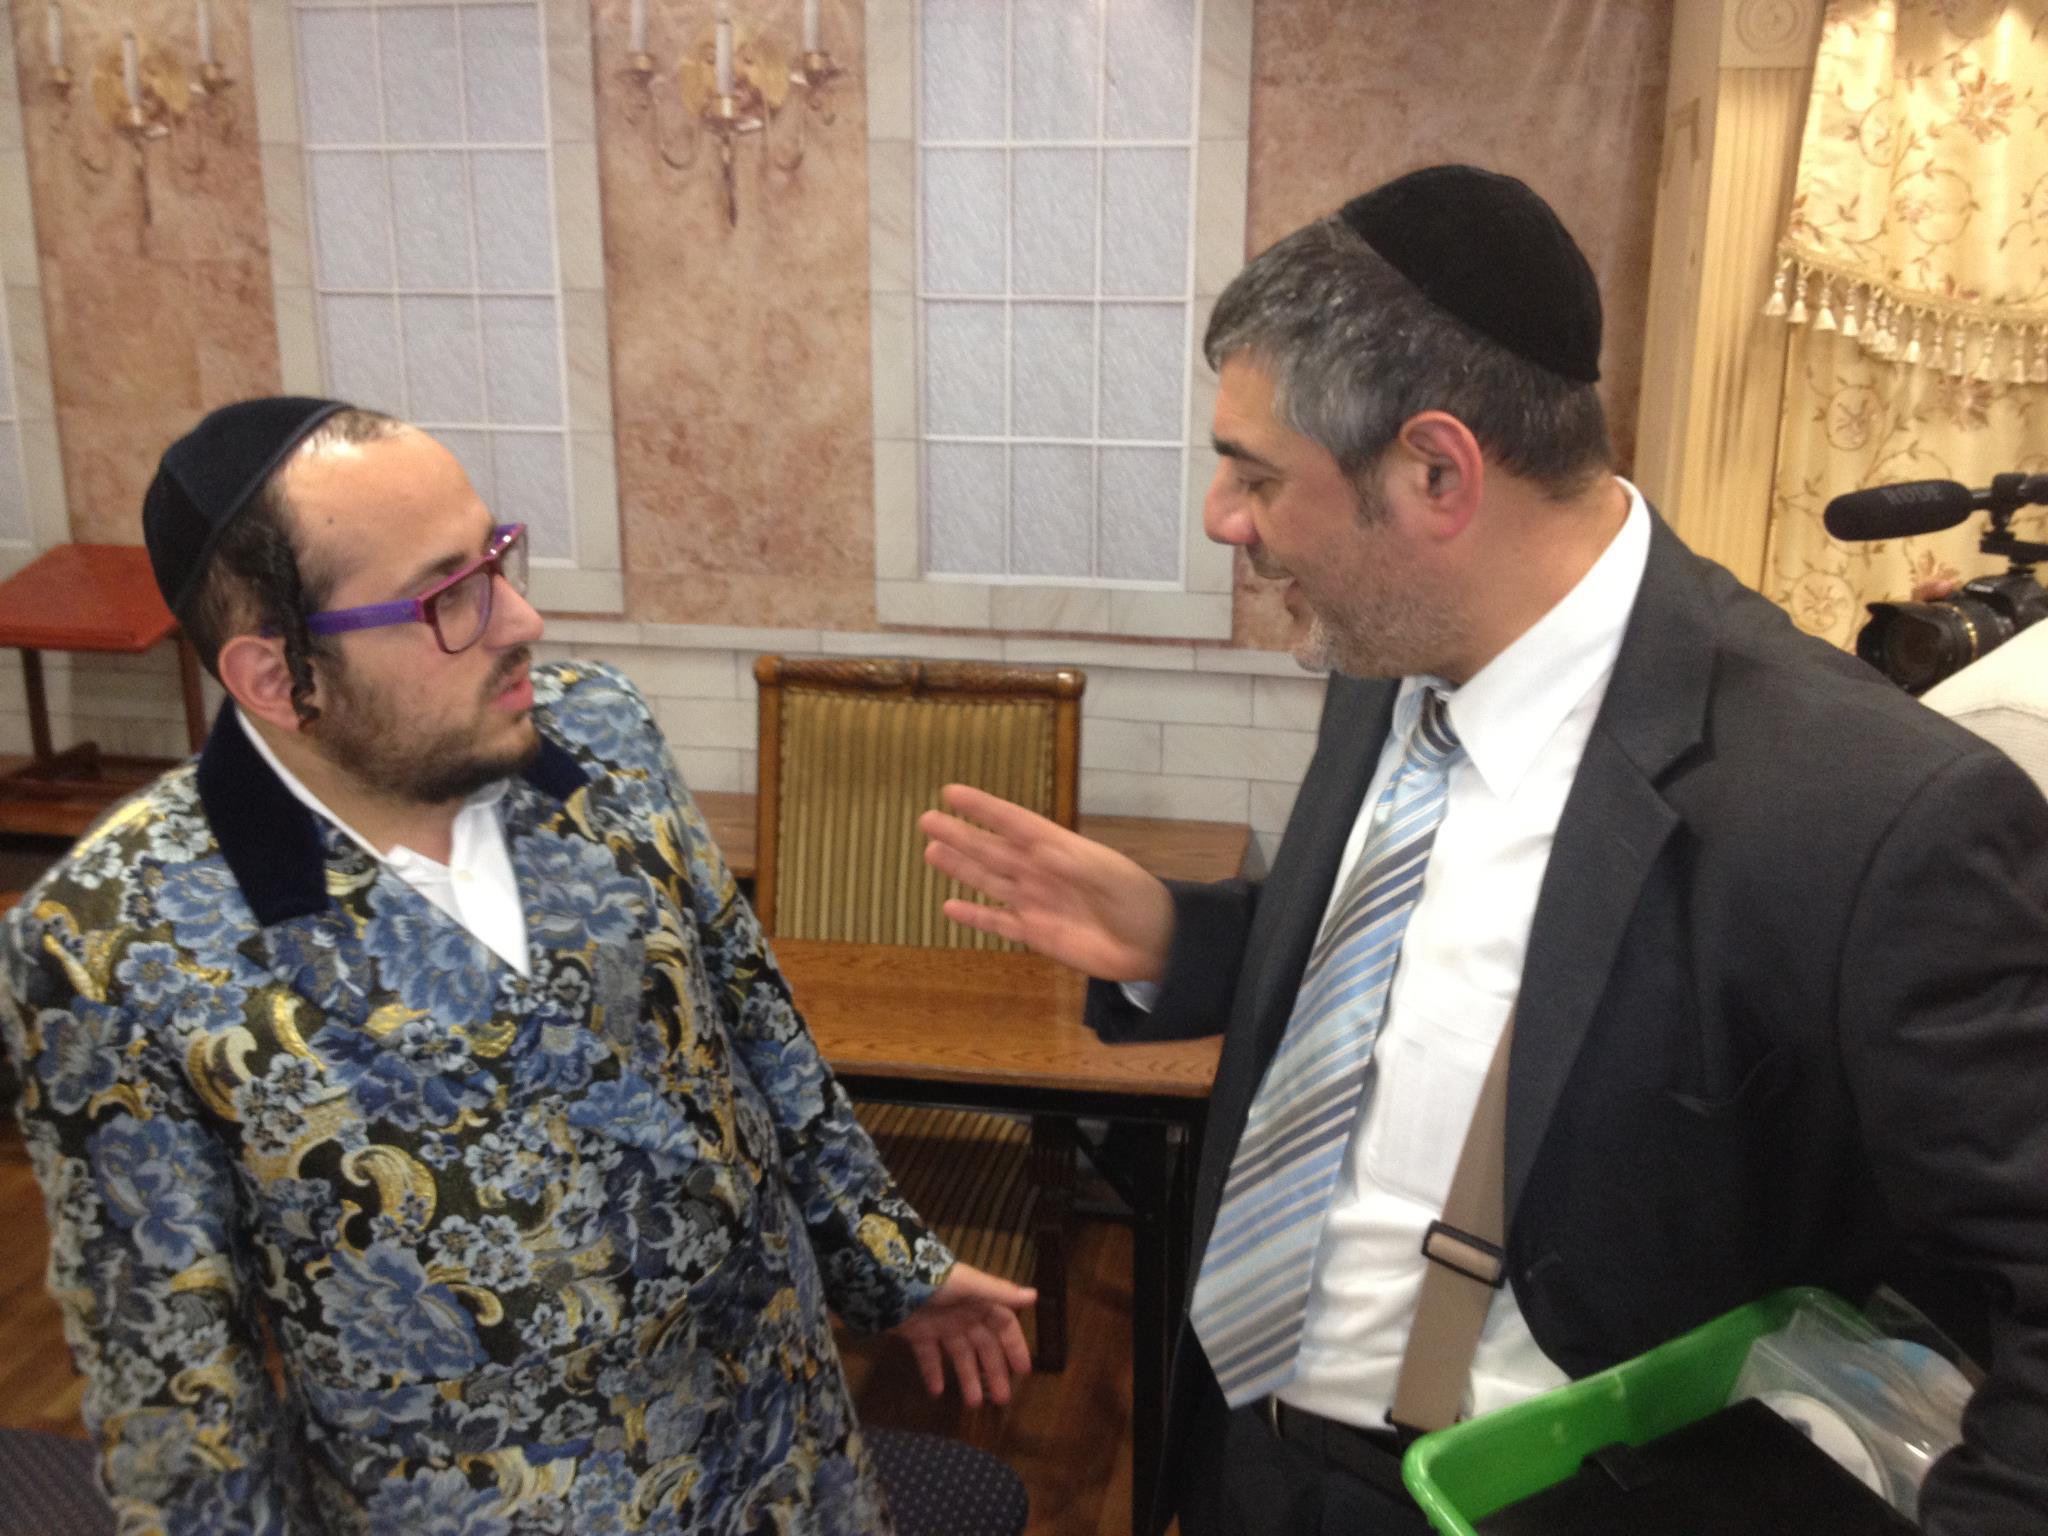 Rabbi Yossi Mizrachi and Lipa Schmeltzer - The Odd Couple